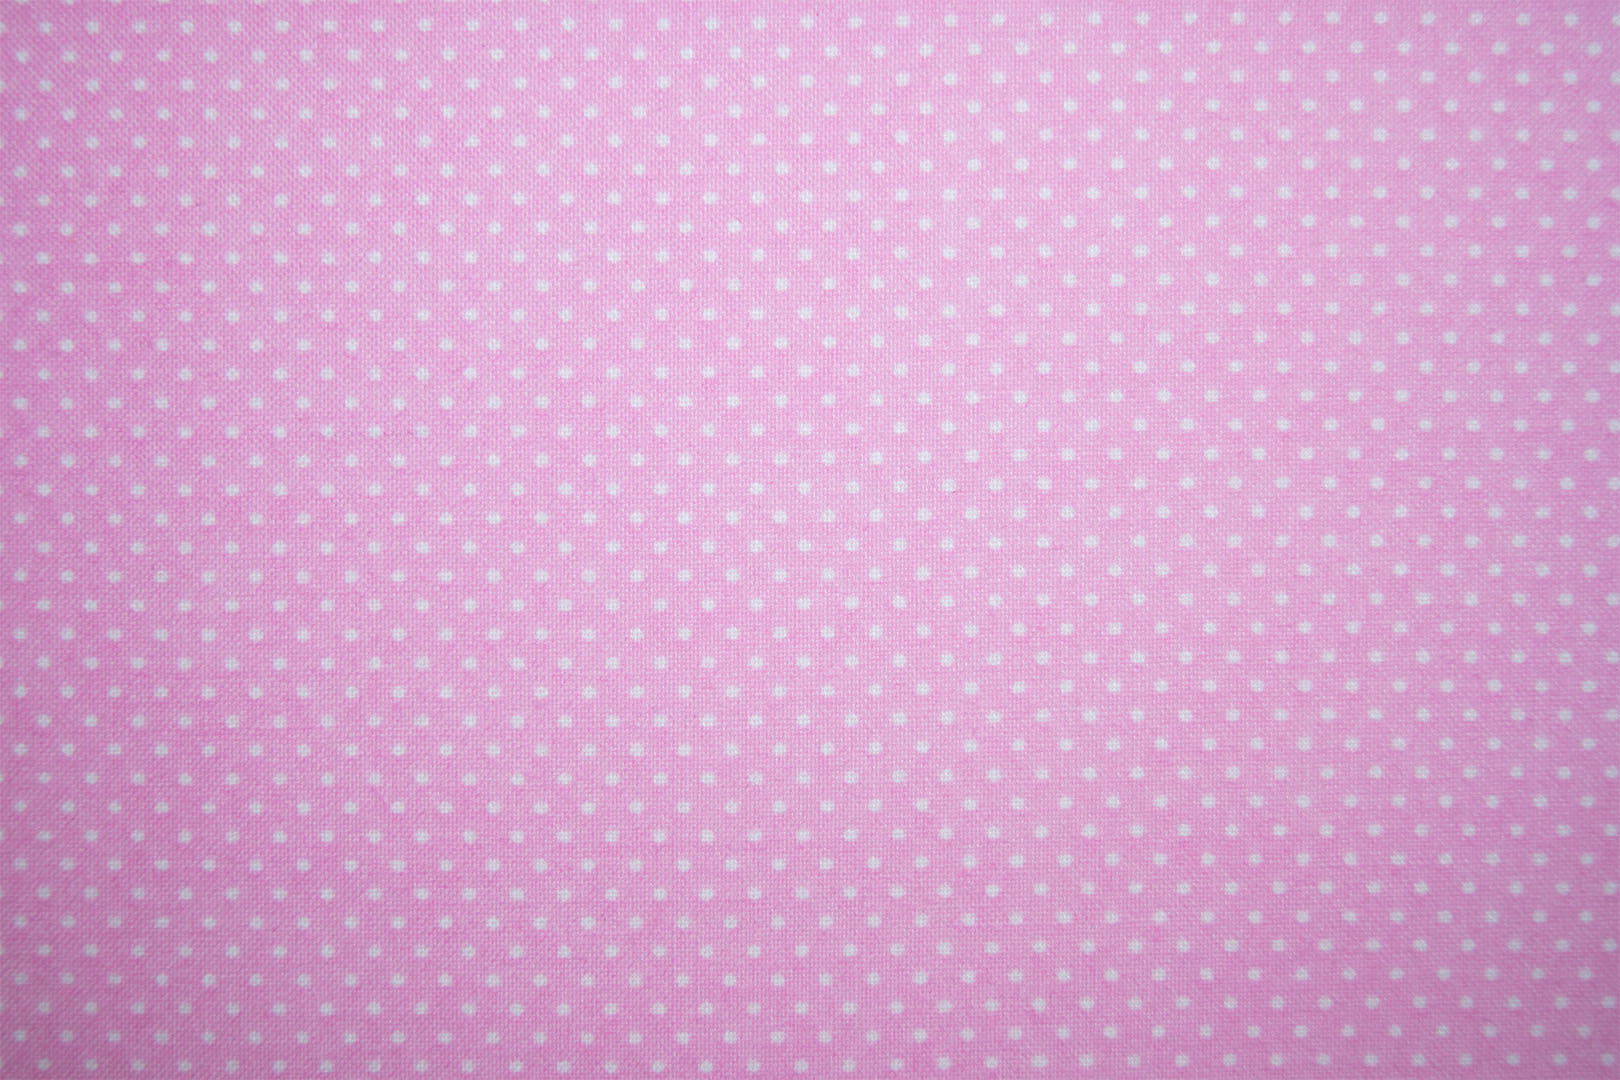 78_20707_pink